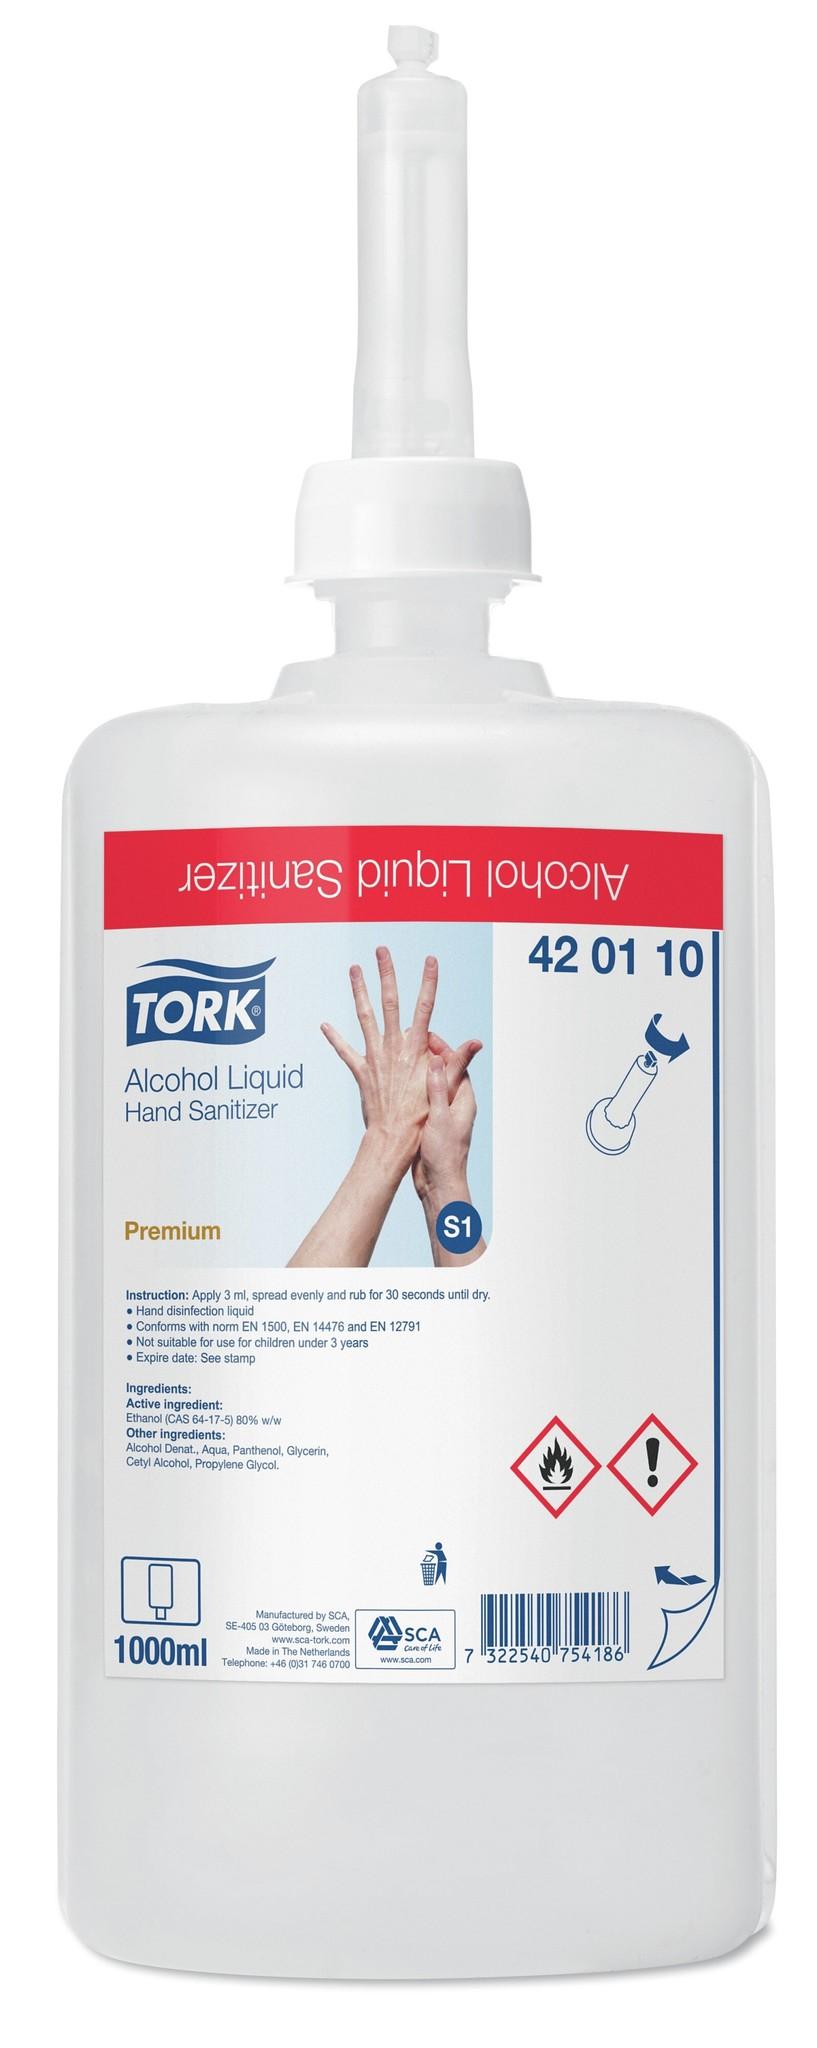 6x Tork Alcohol Liquid Hand Sanitizer